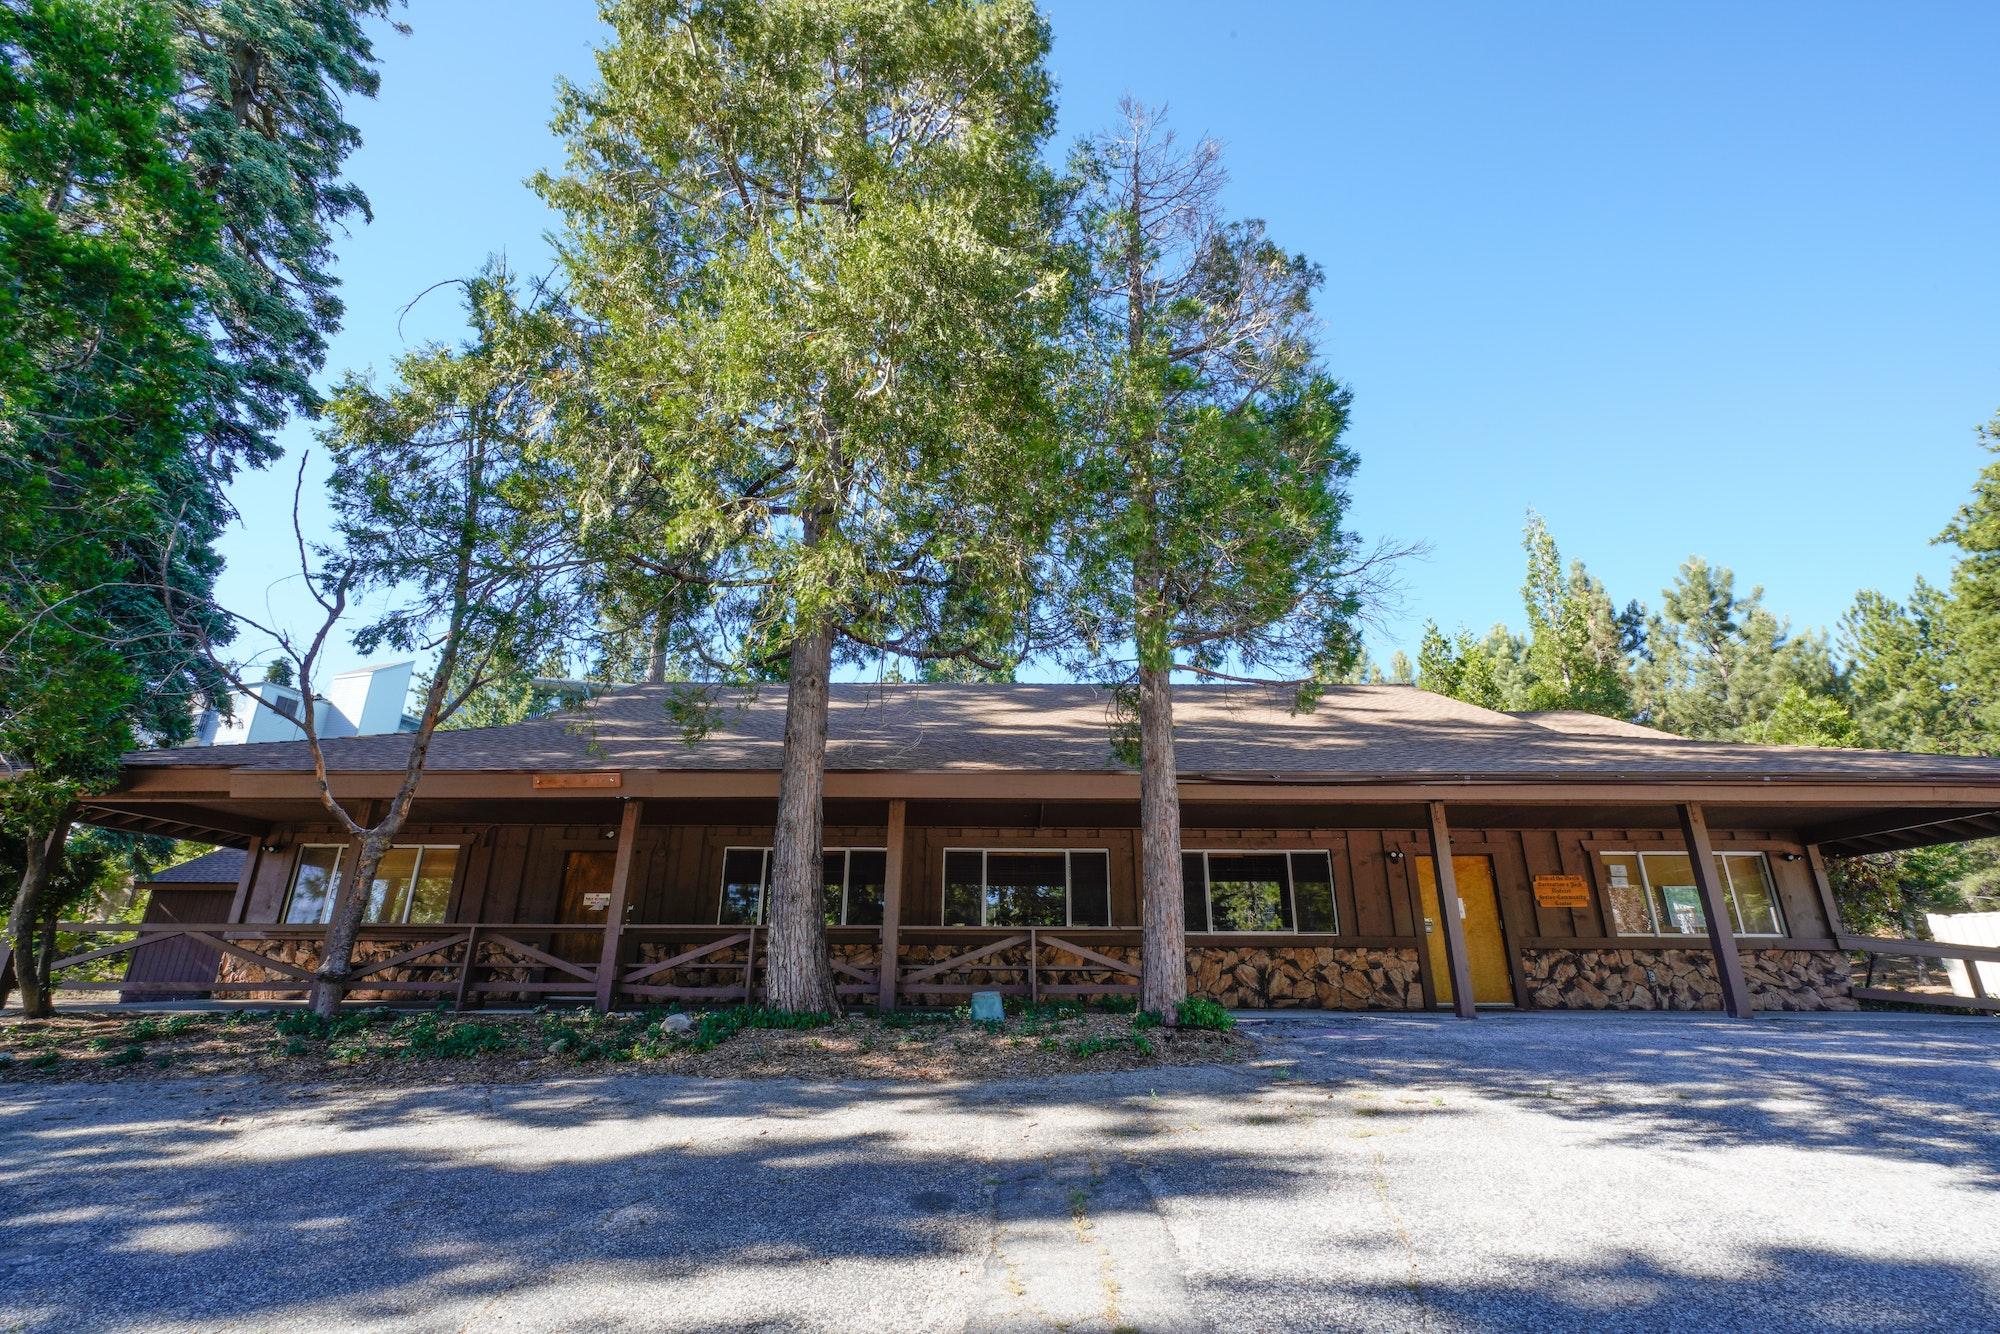 Twin Peaks Senior/Community Center